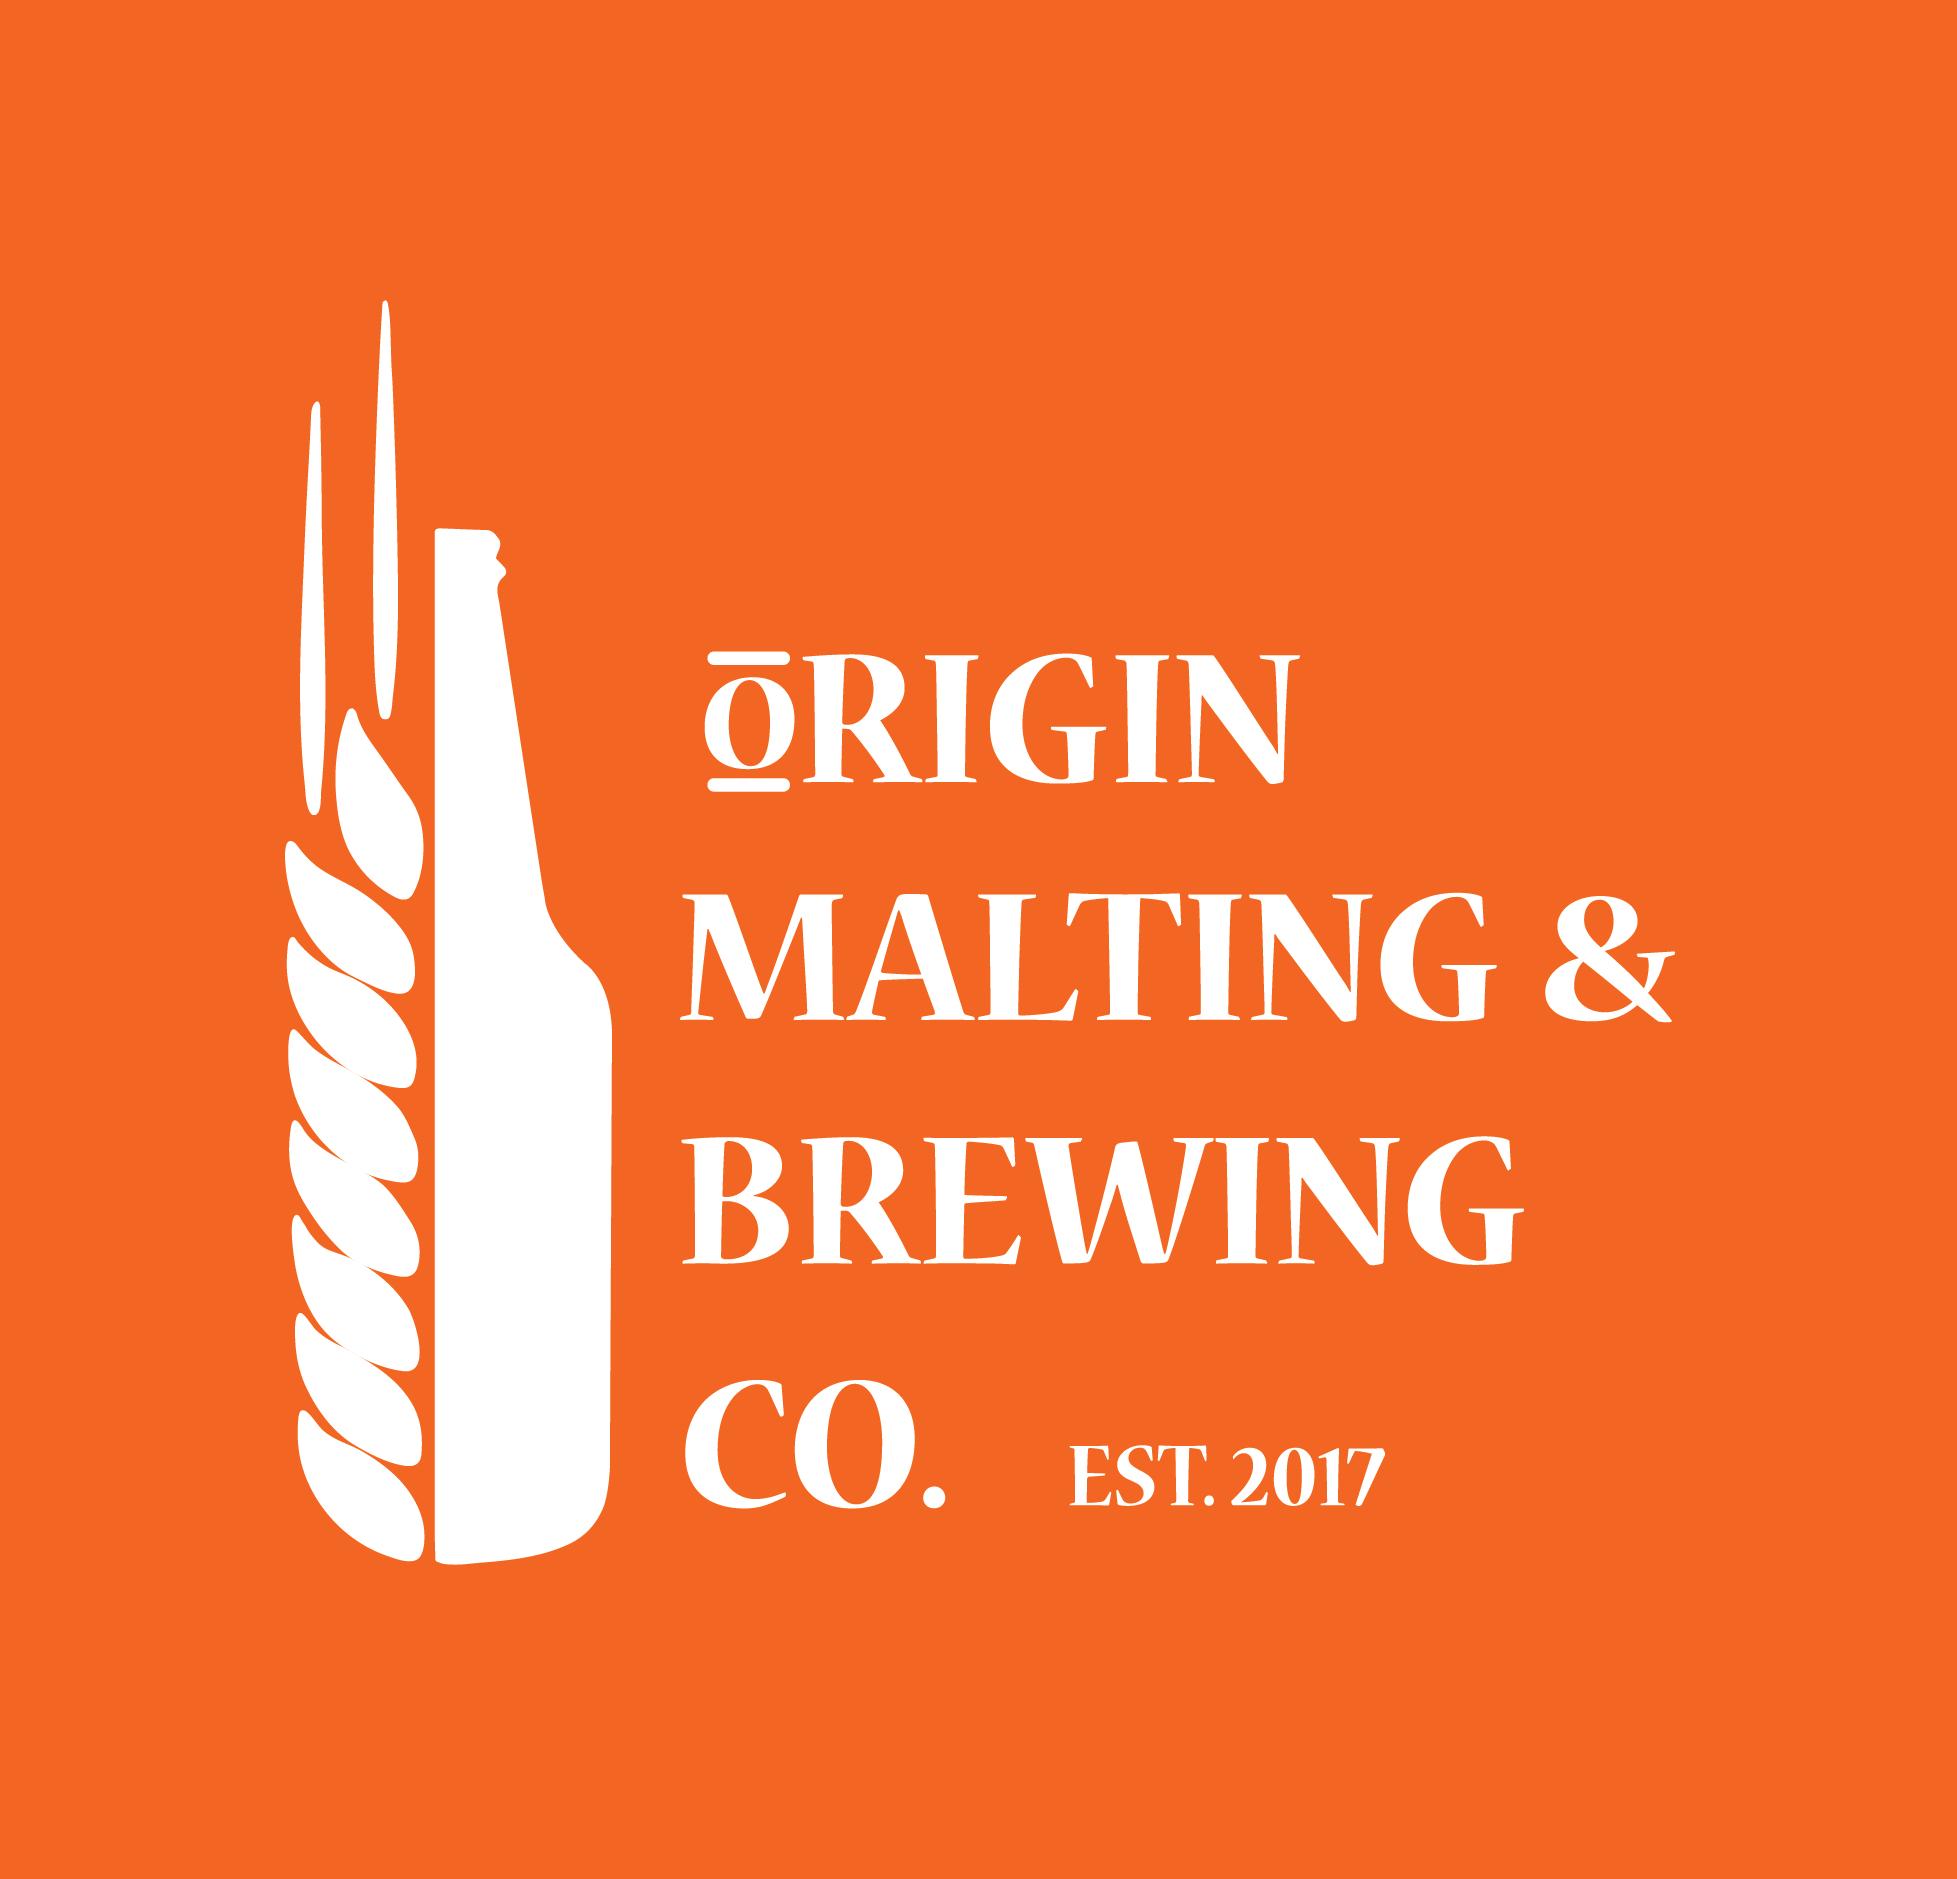 Origin Malting & Brewing